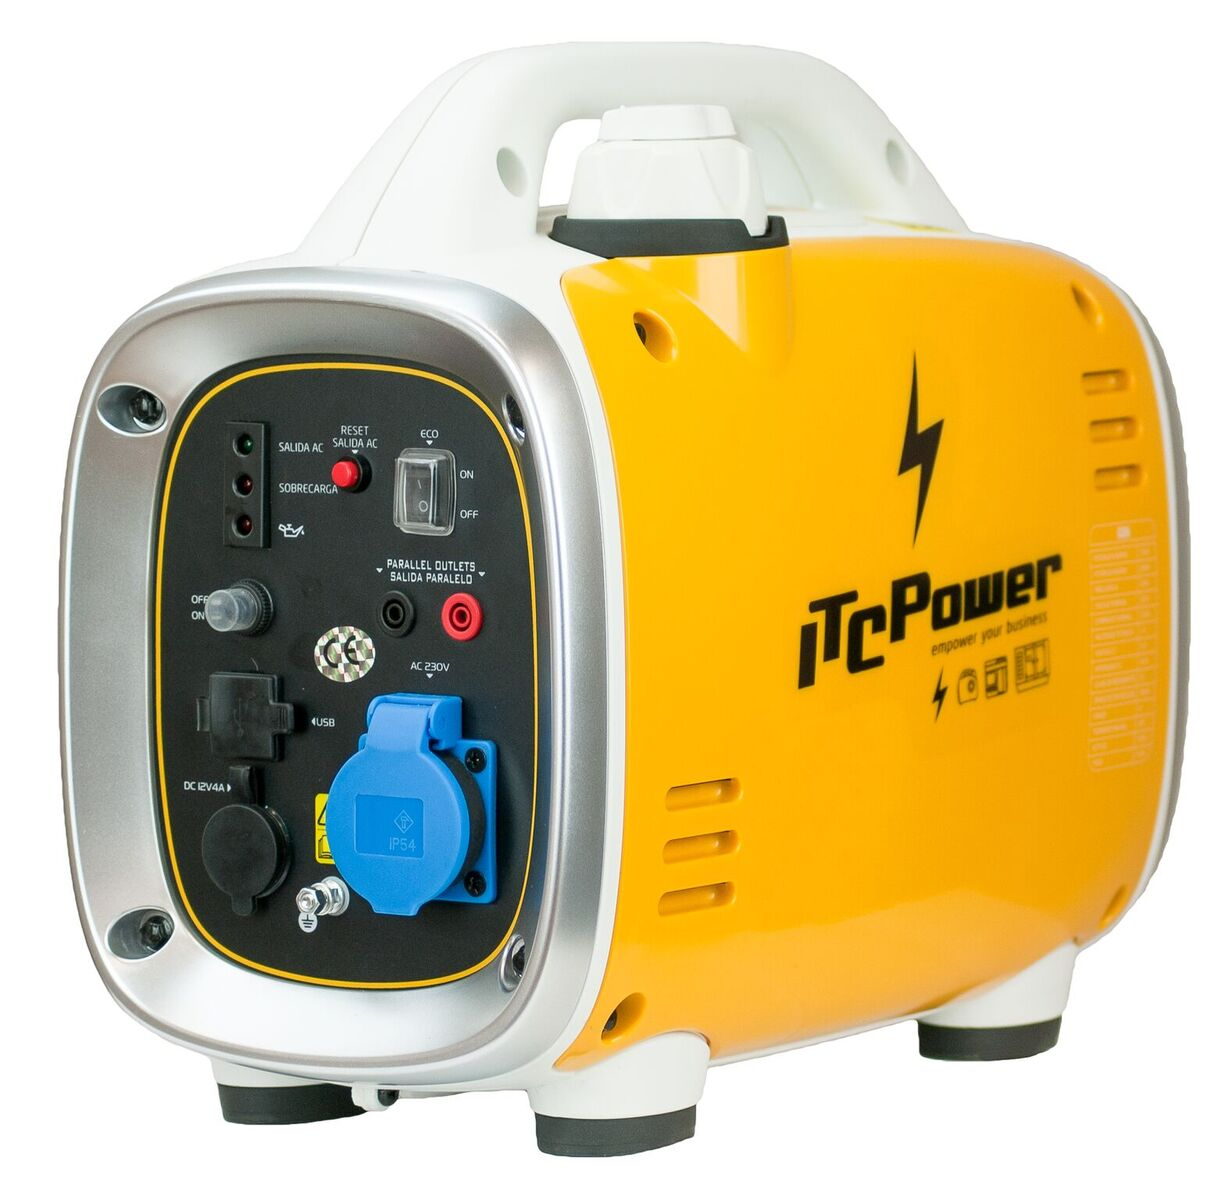 ITC POWER Inverter 900 Watt Benzin GG9i Stromaggregat